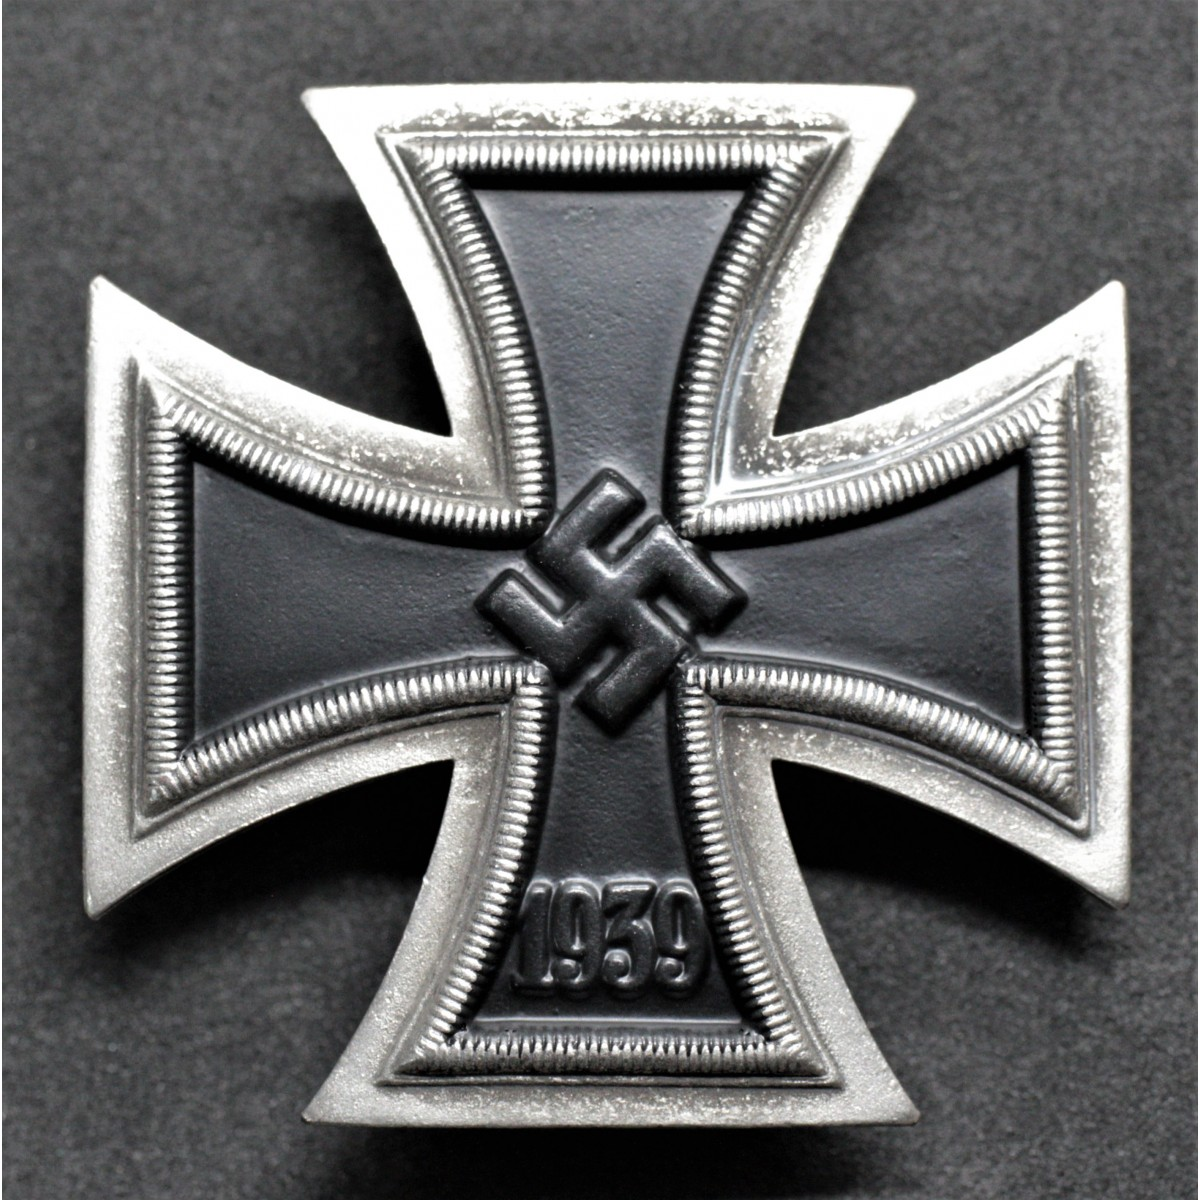 1957 ORDER OF THE GERMAN CROSS Repro WW2 Military Award Badge SILVER